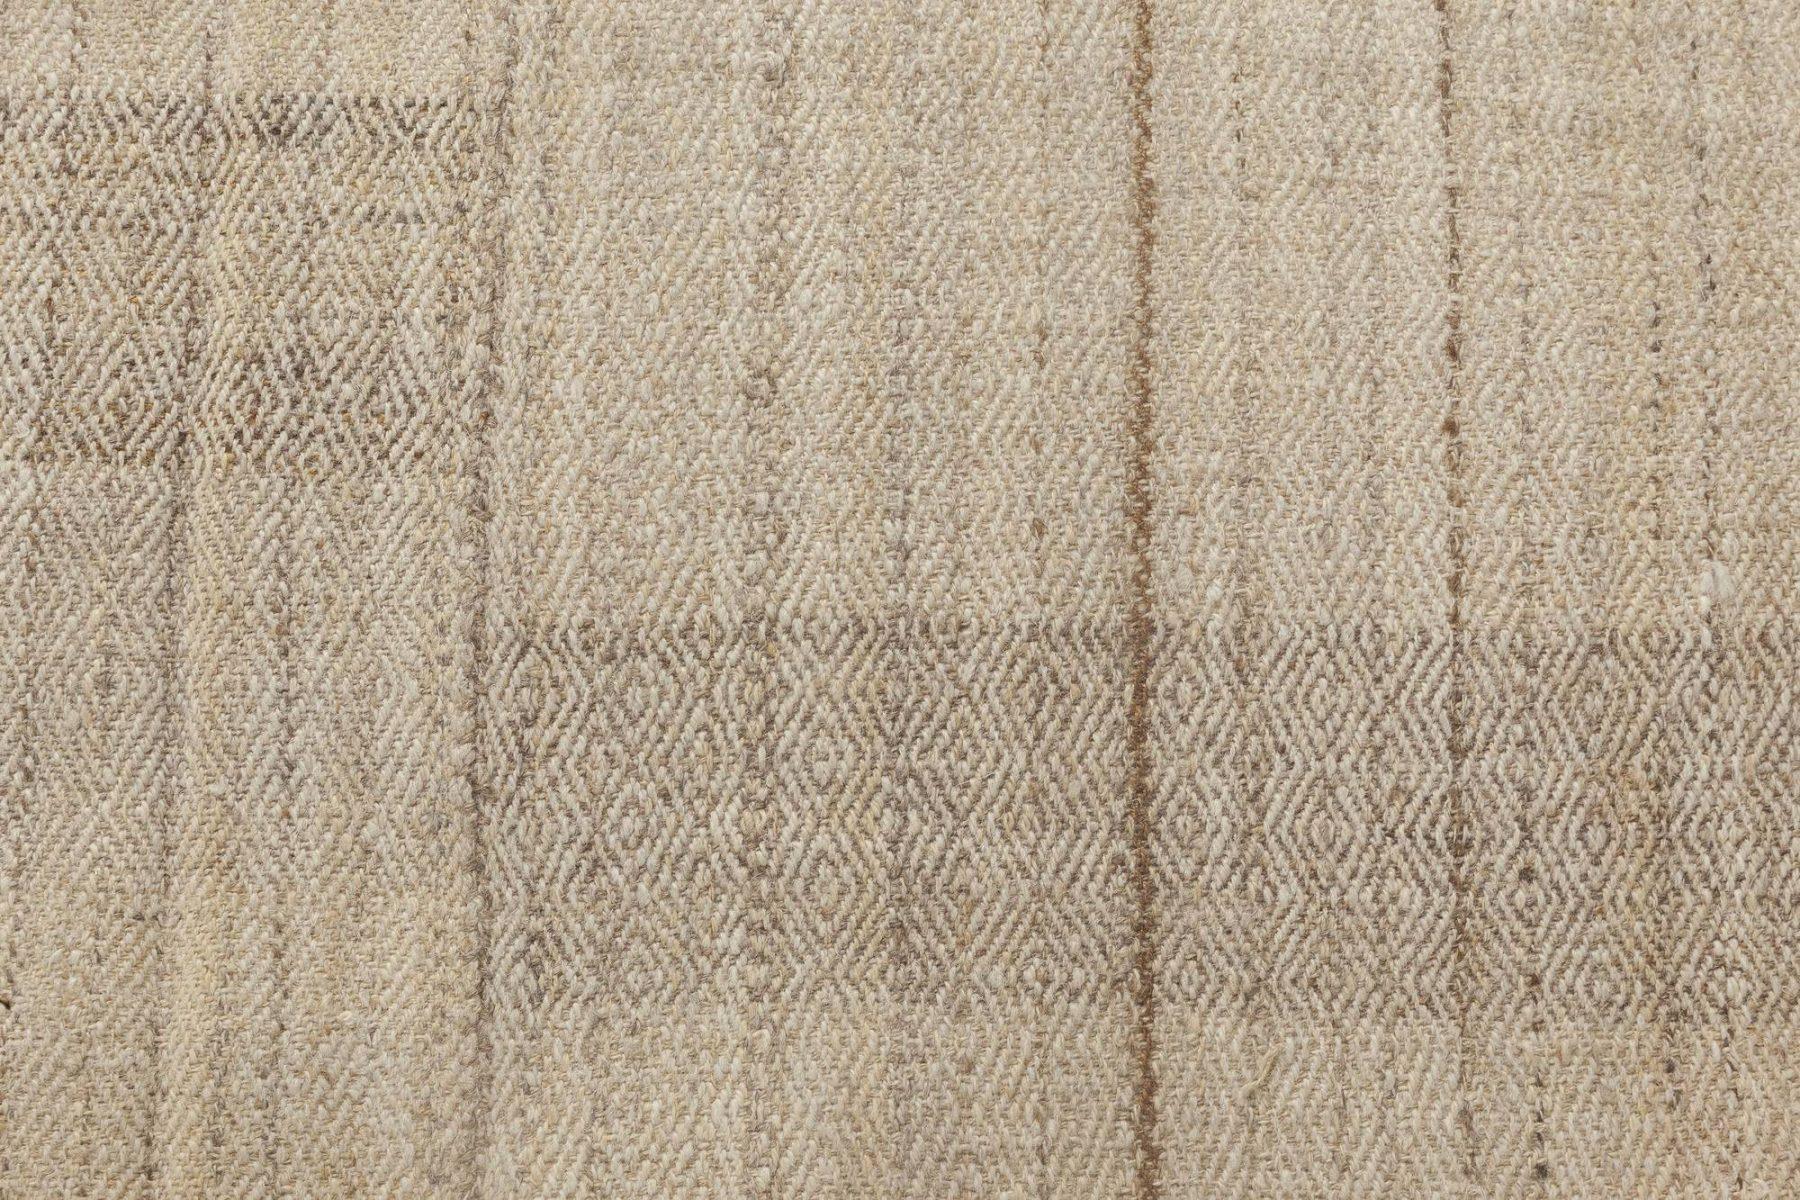 Persian Mazandaran Hand Knotted Wool Kilim Rug in Sandy Beige Shade BB6439